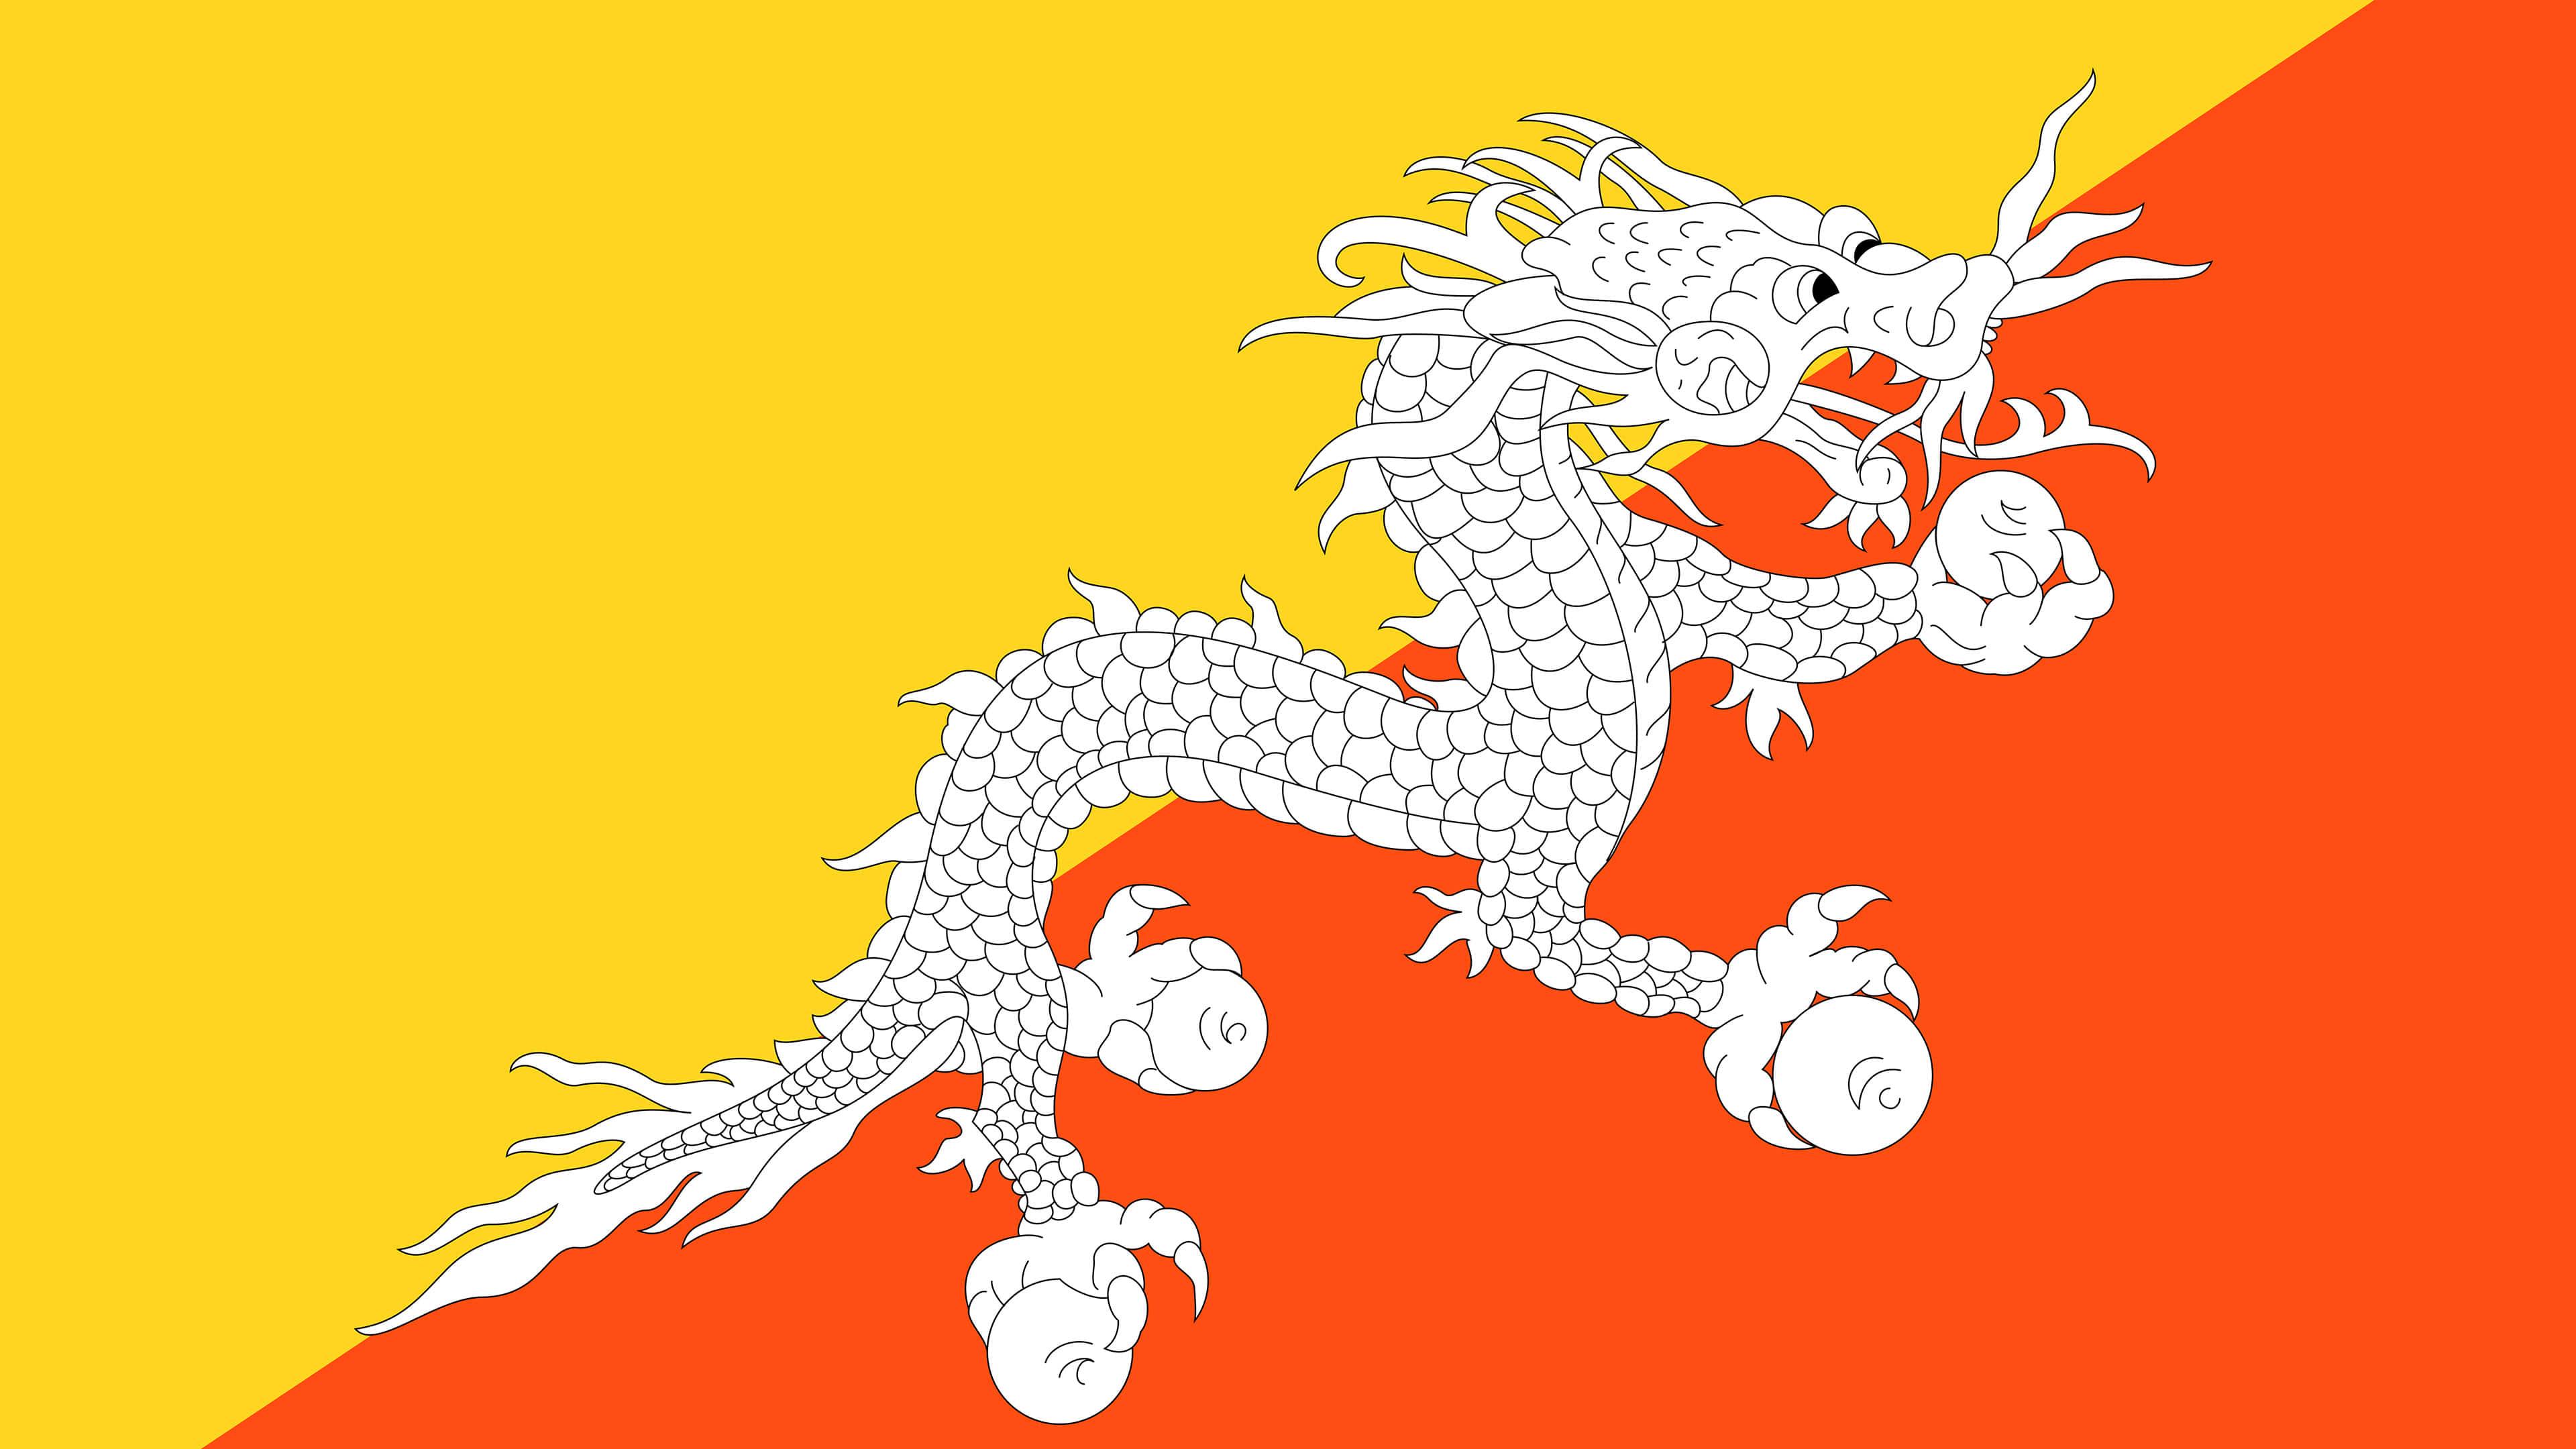 bhutan flag uhd 4k wallpaper